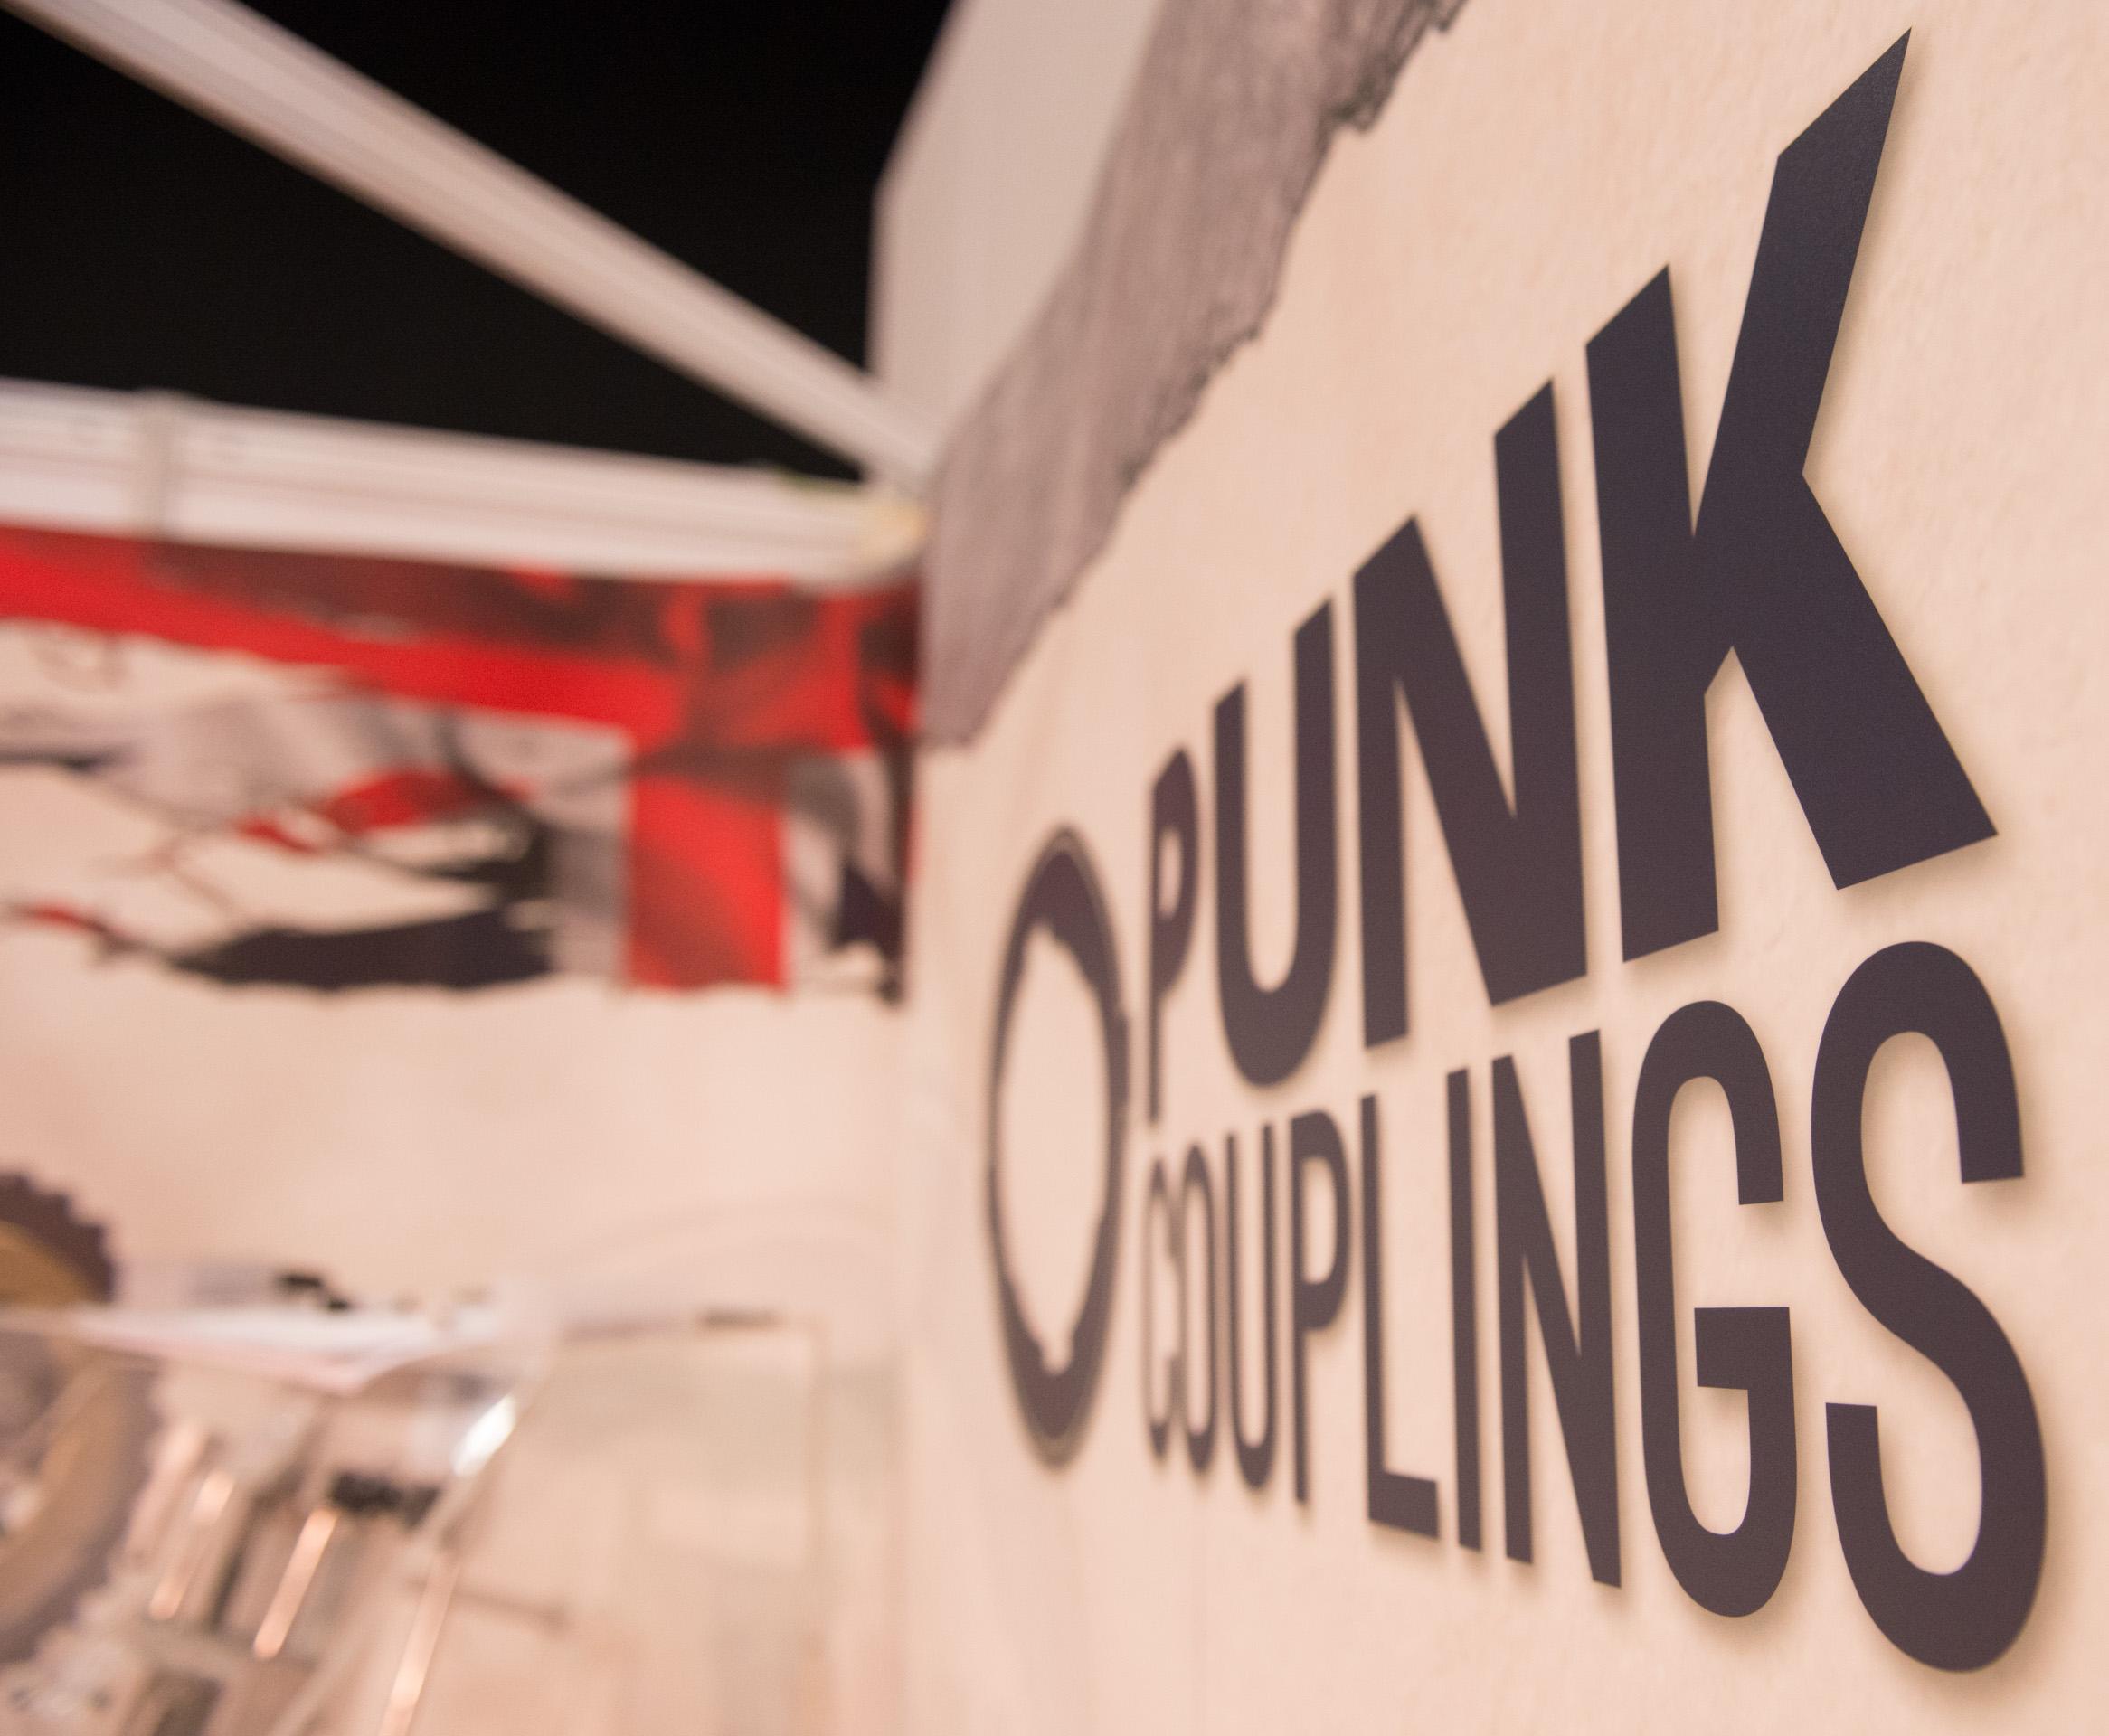 engineering-design-show-punk-couplings-punk-nut-punk-prime-imp_9988